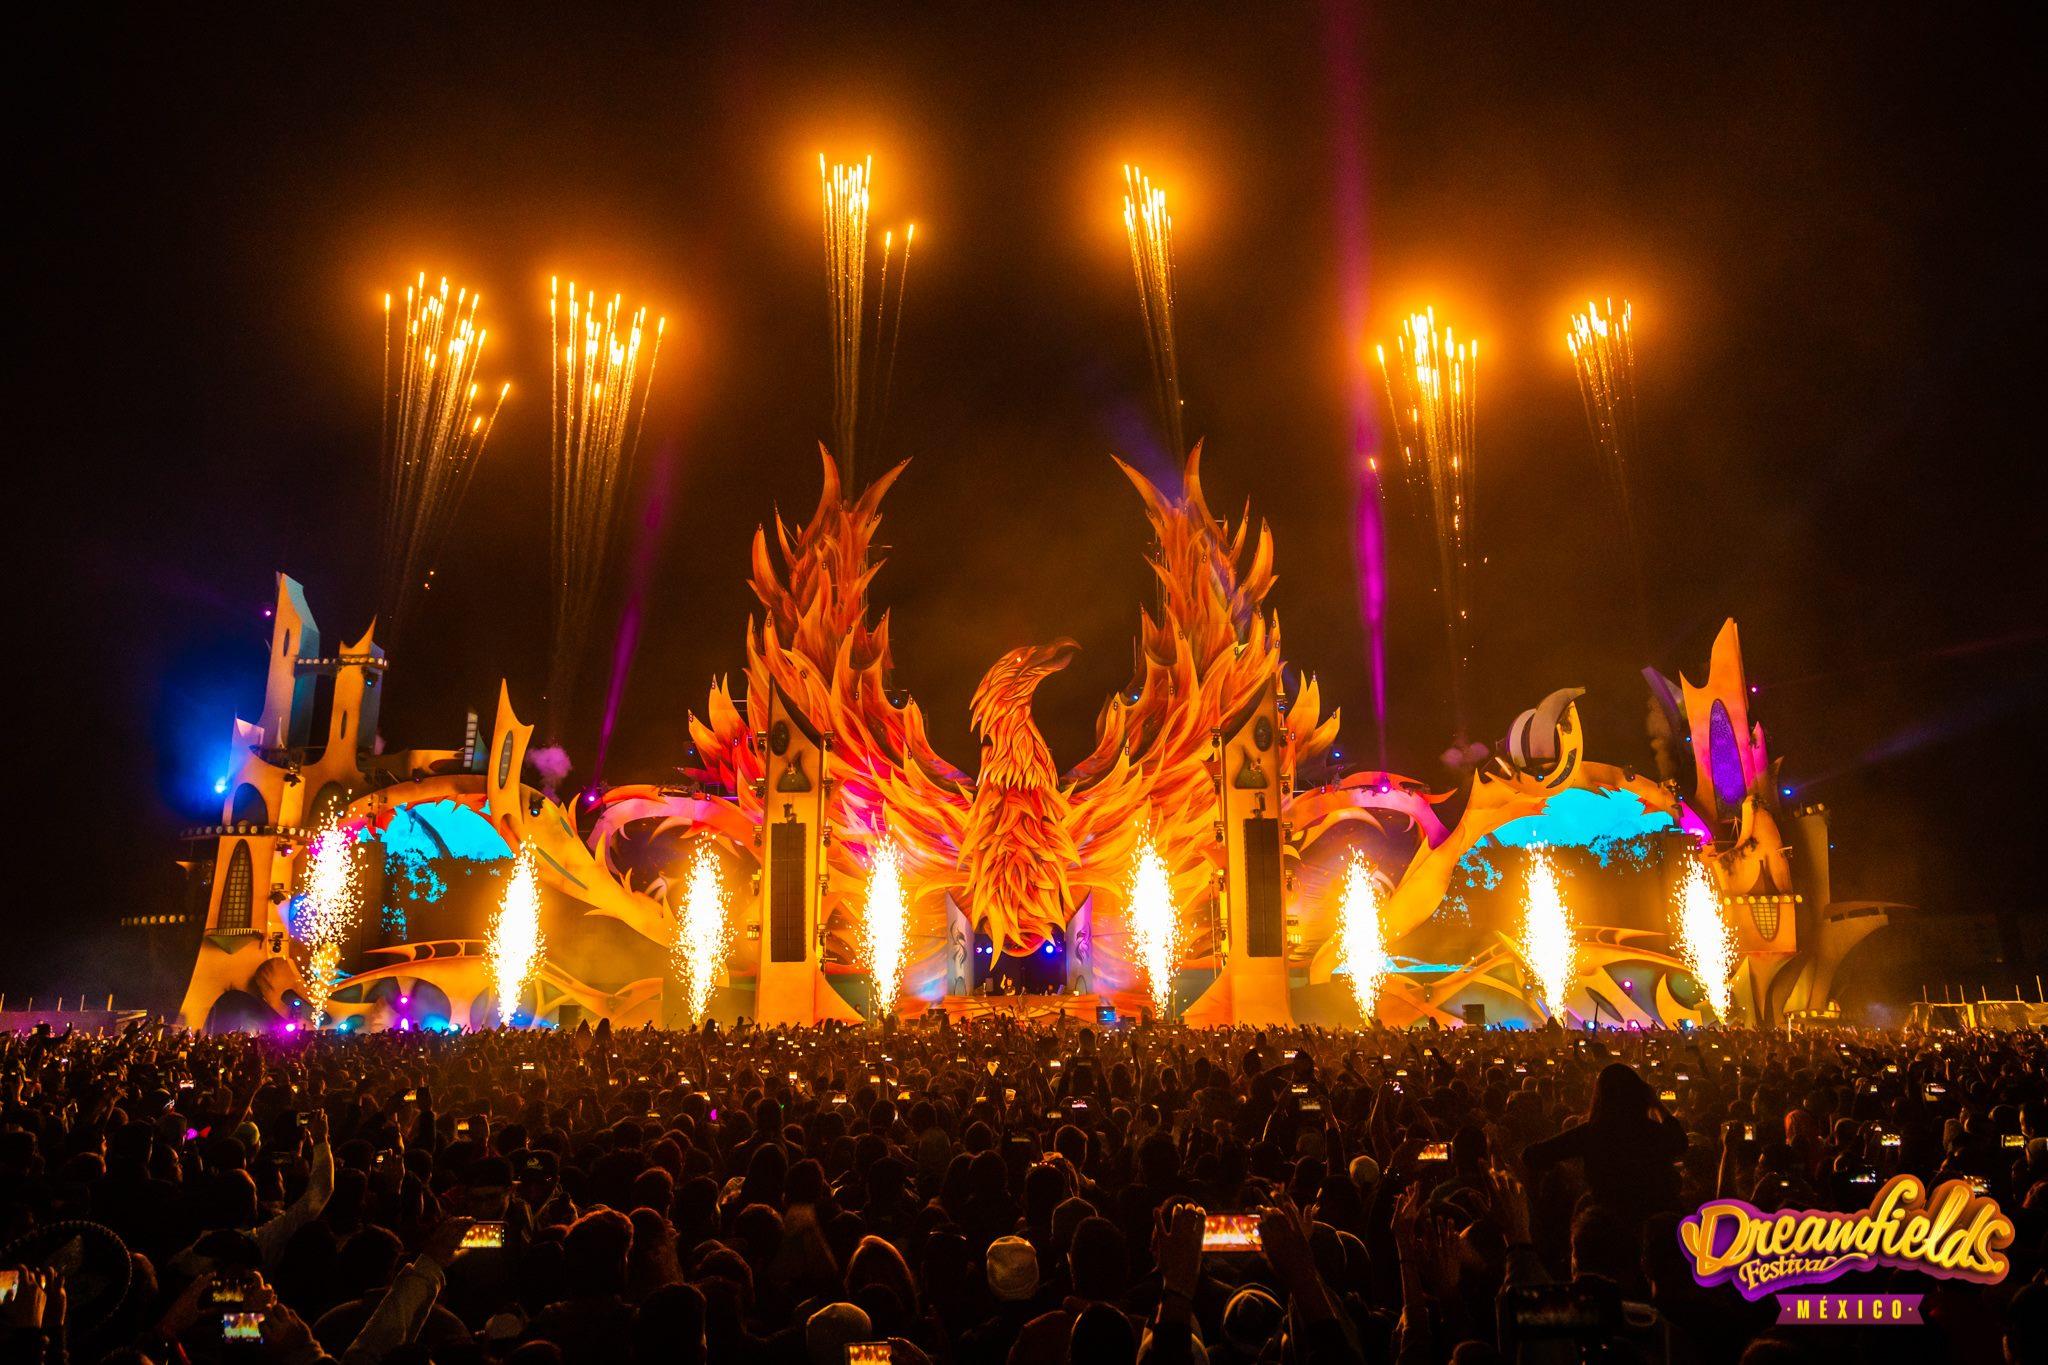 Dreamfields Mexico 2018 - Mainstage